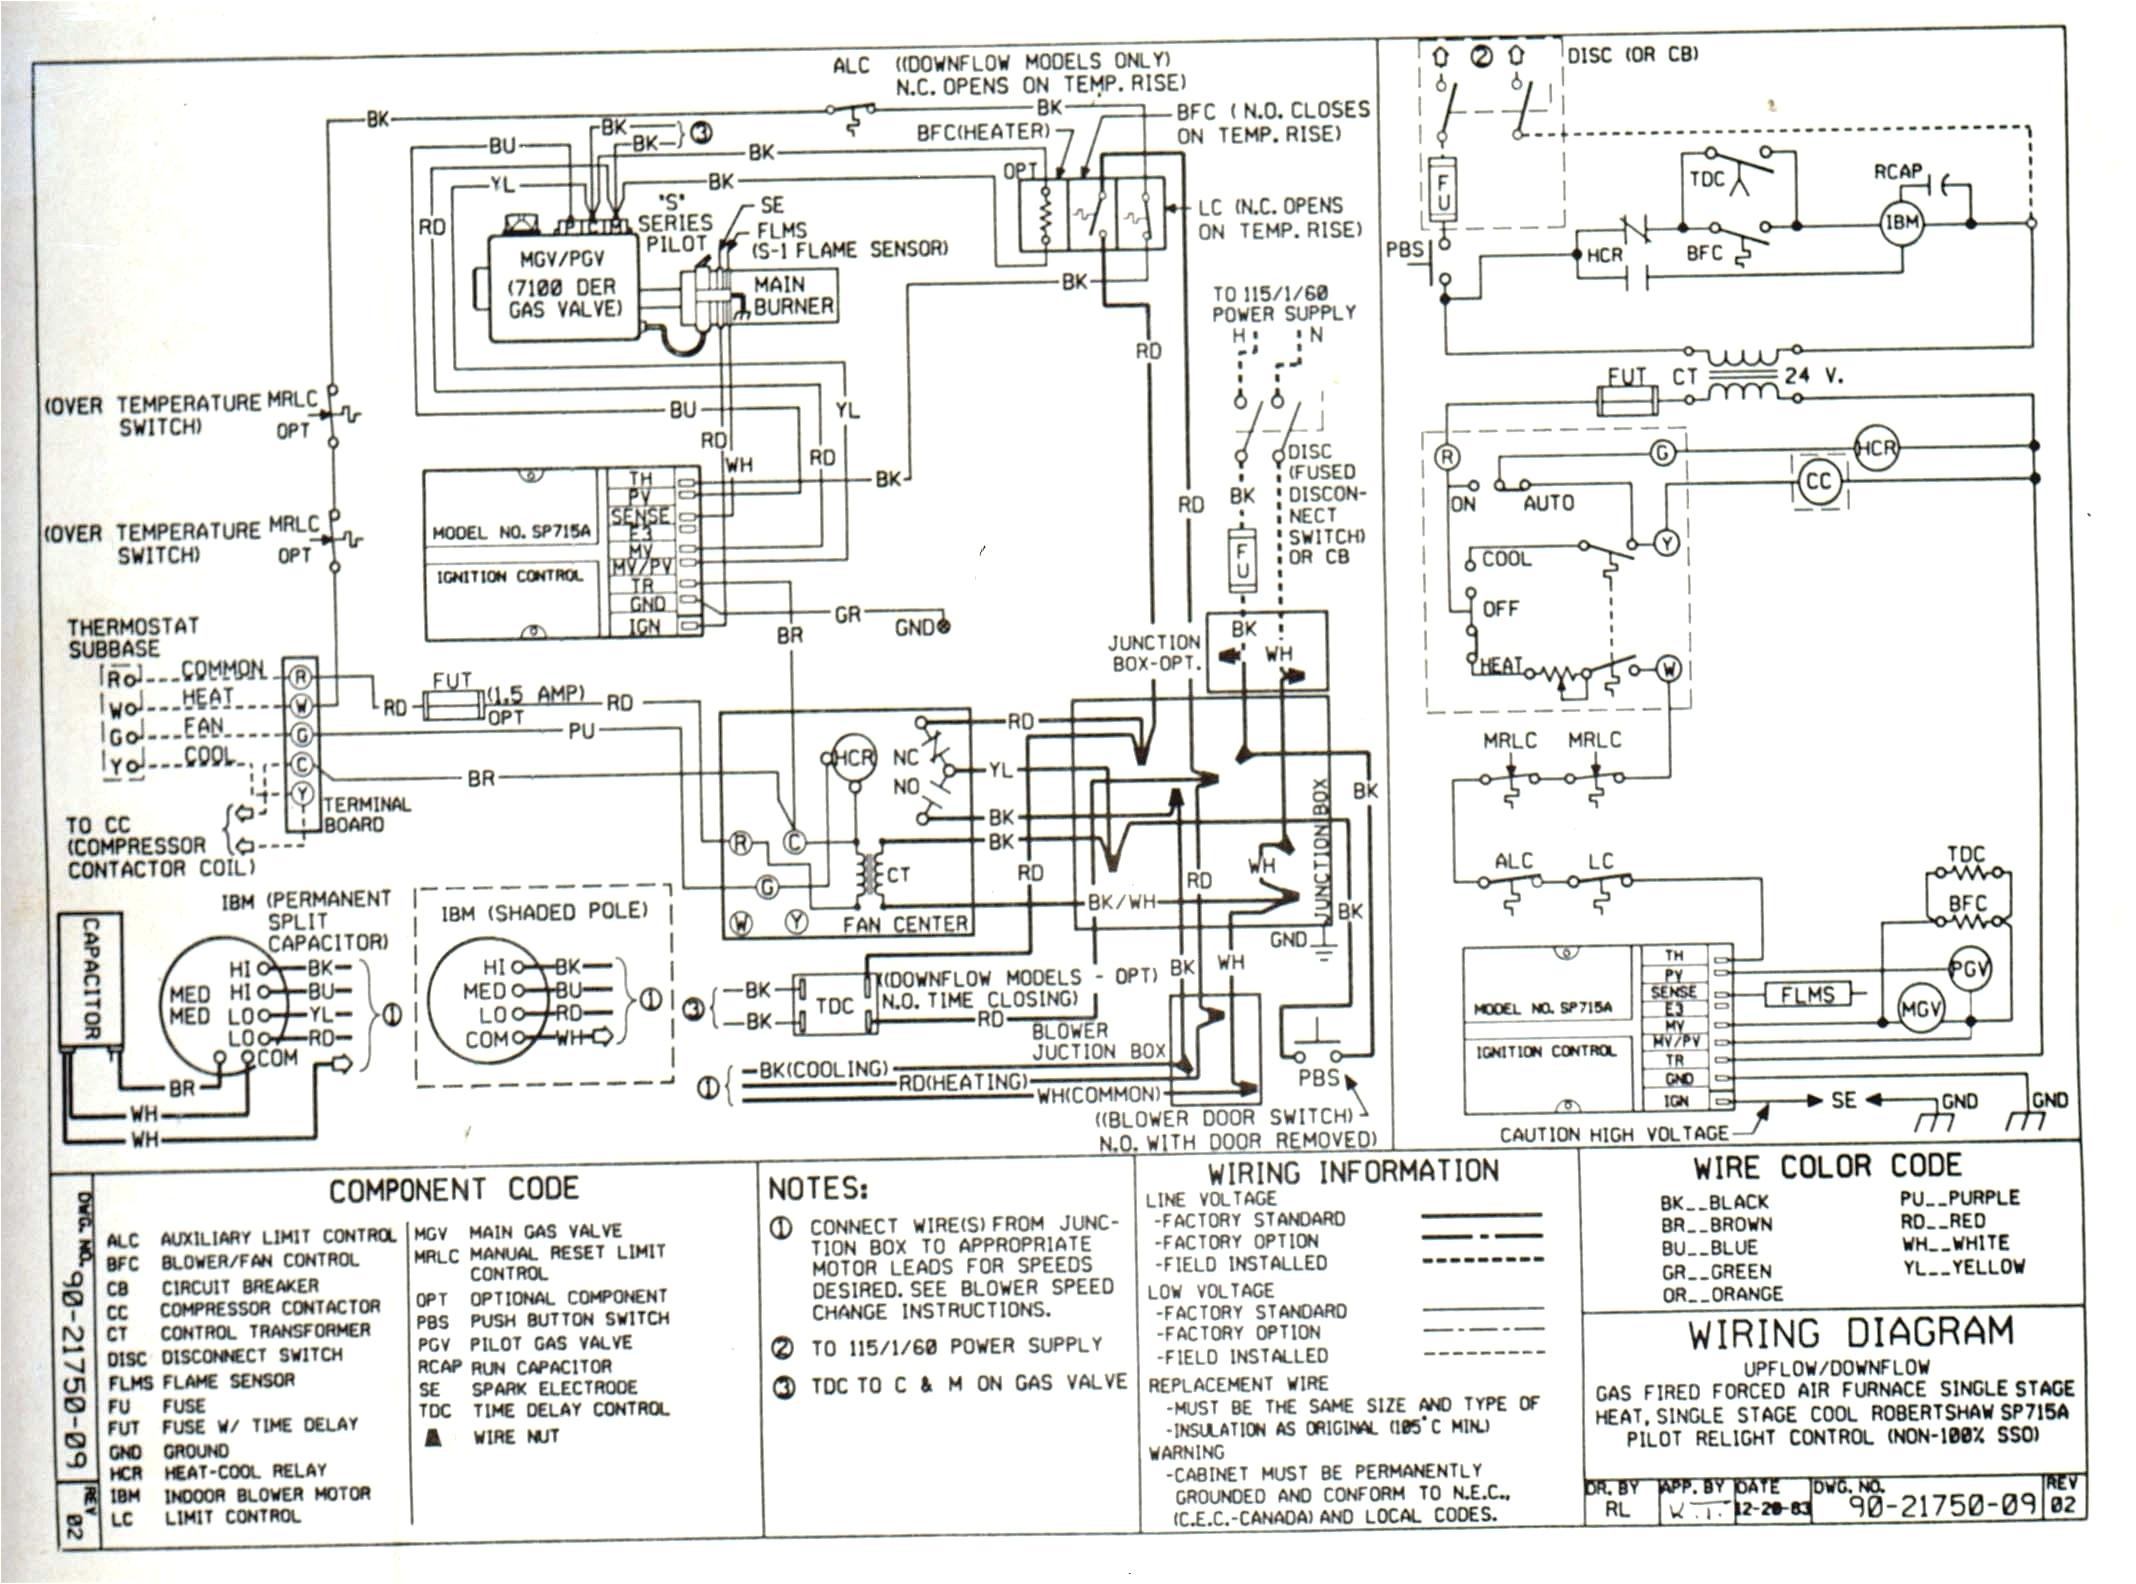 janitrol furnace wiring schematic free data diagram schematic goodman air handler fan relay wiring diagram free picture